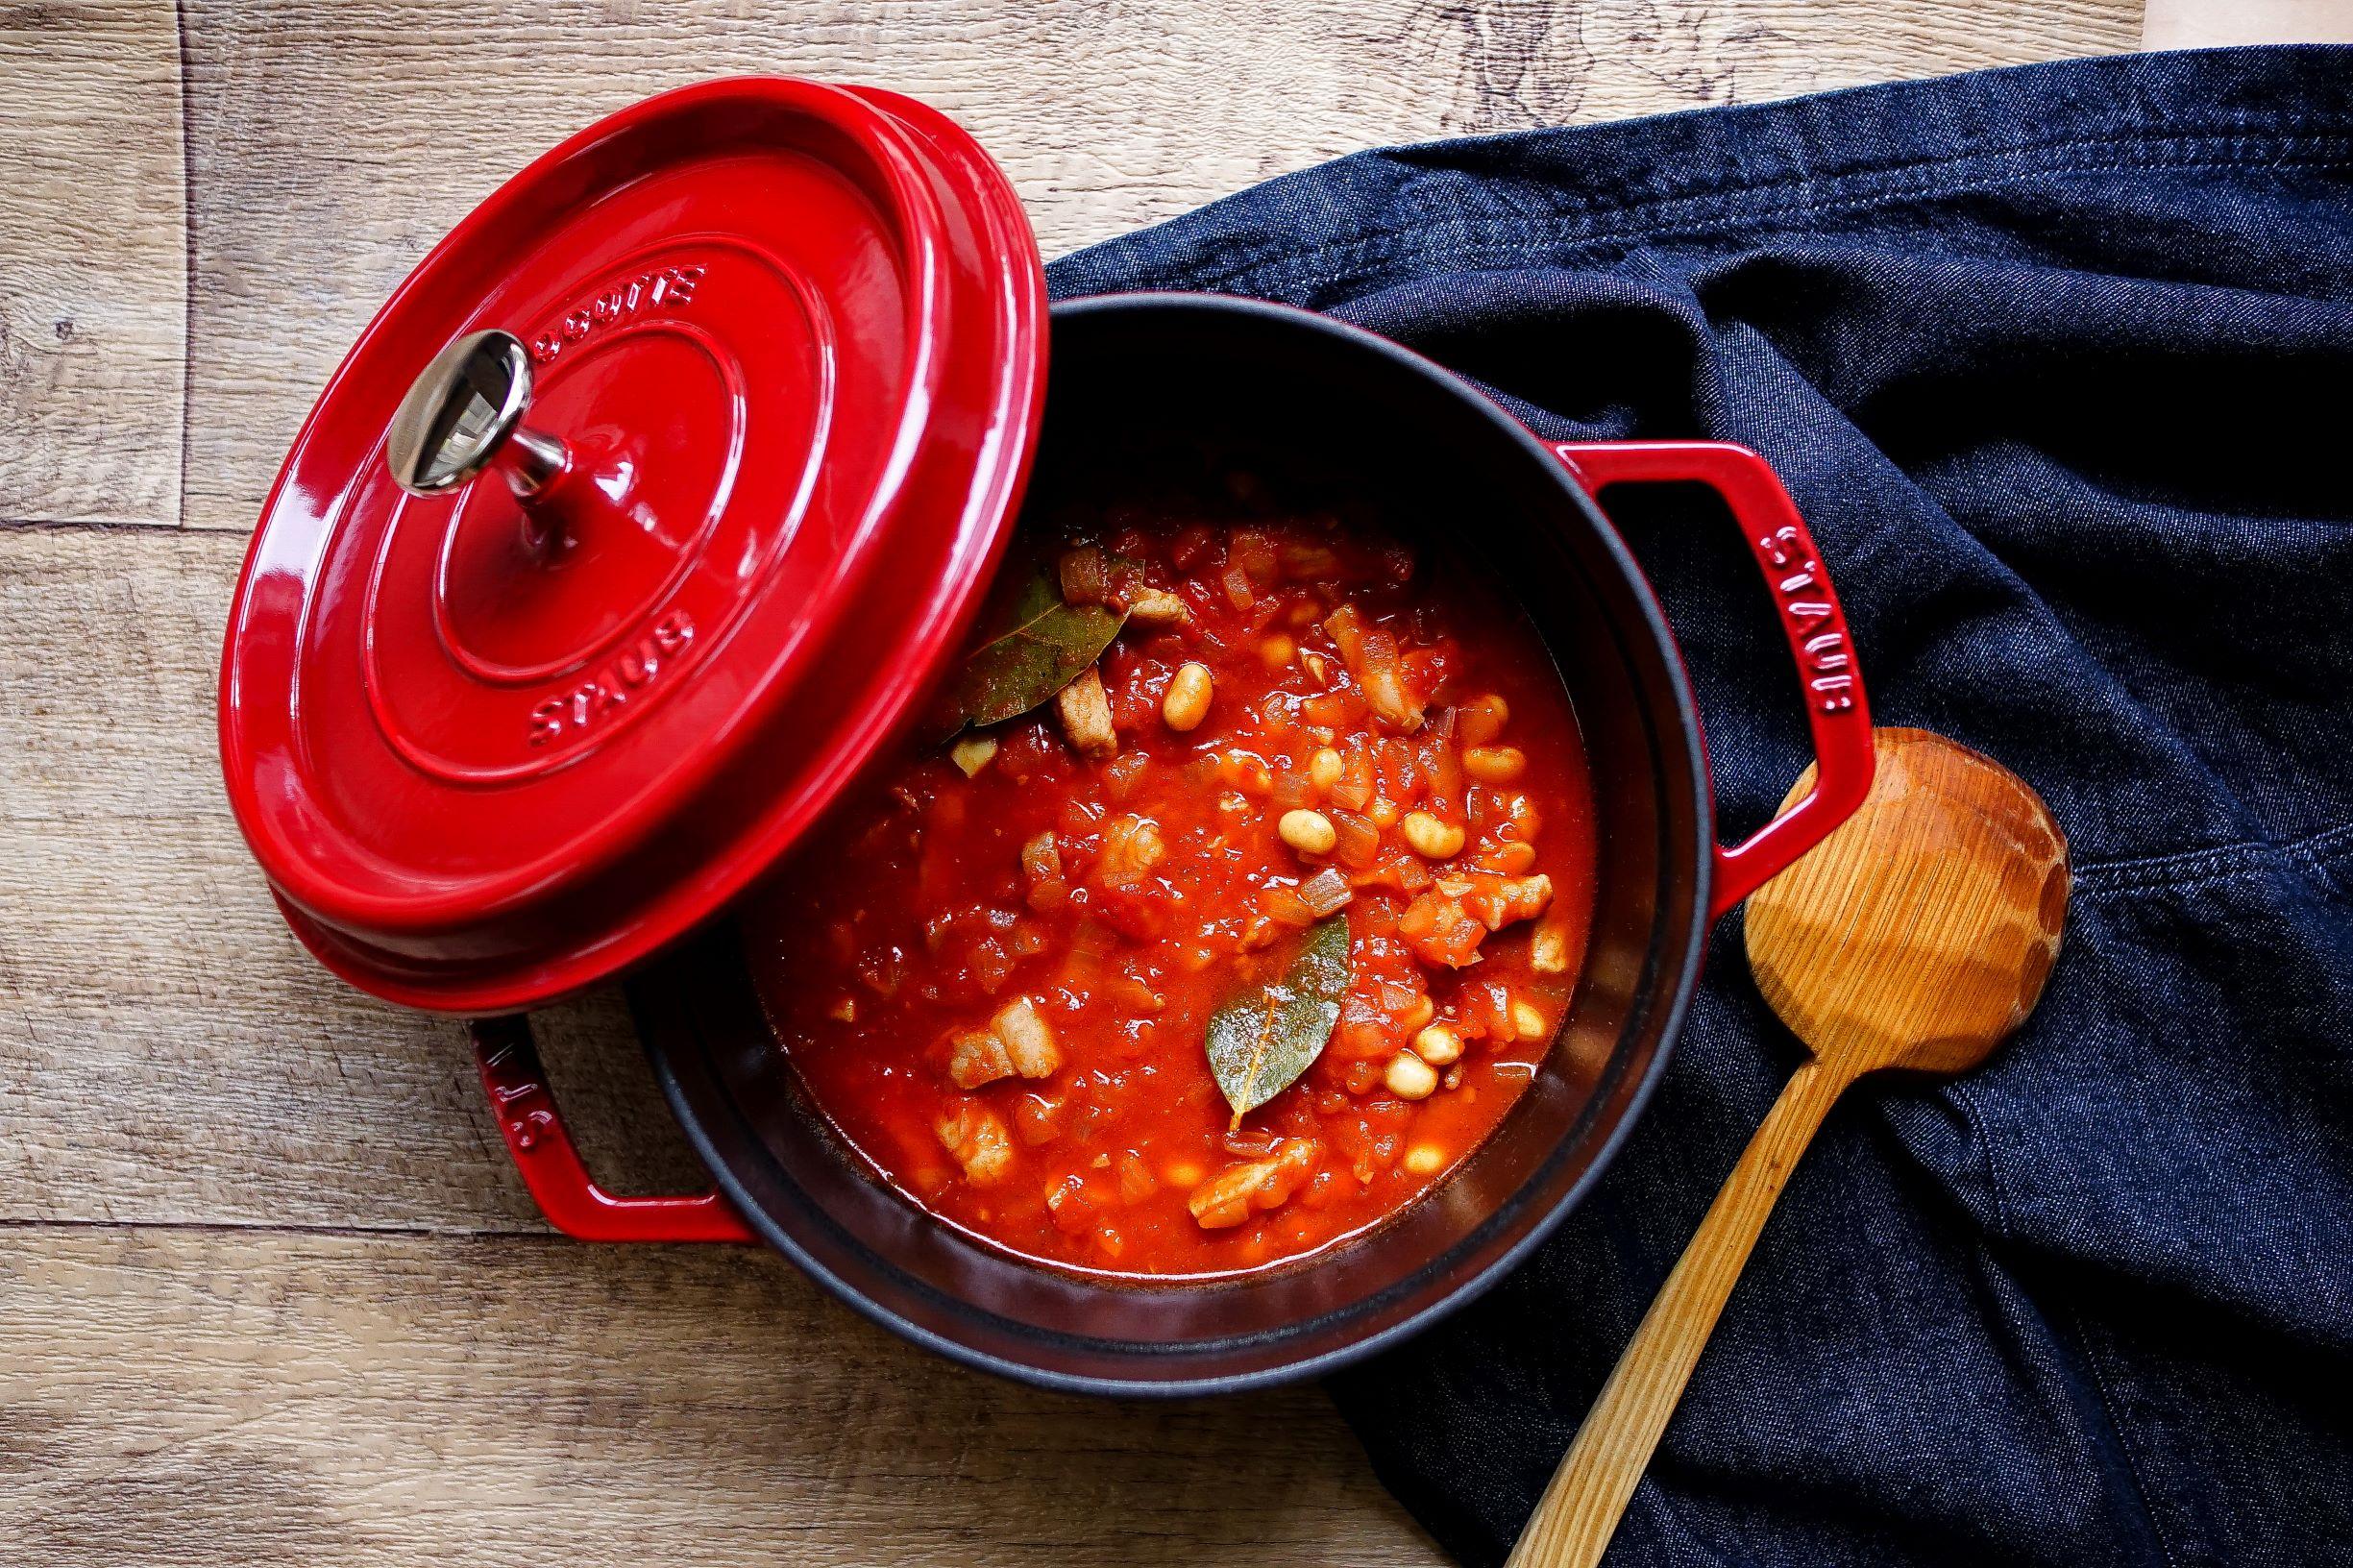 【desakiレシピ㉒】冬は魔法のお鍋で煮込み料理♪「大豆と豚肉のトマト煮」